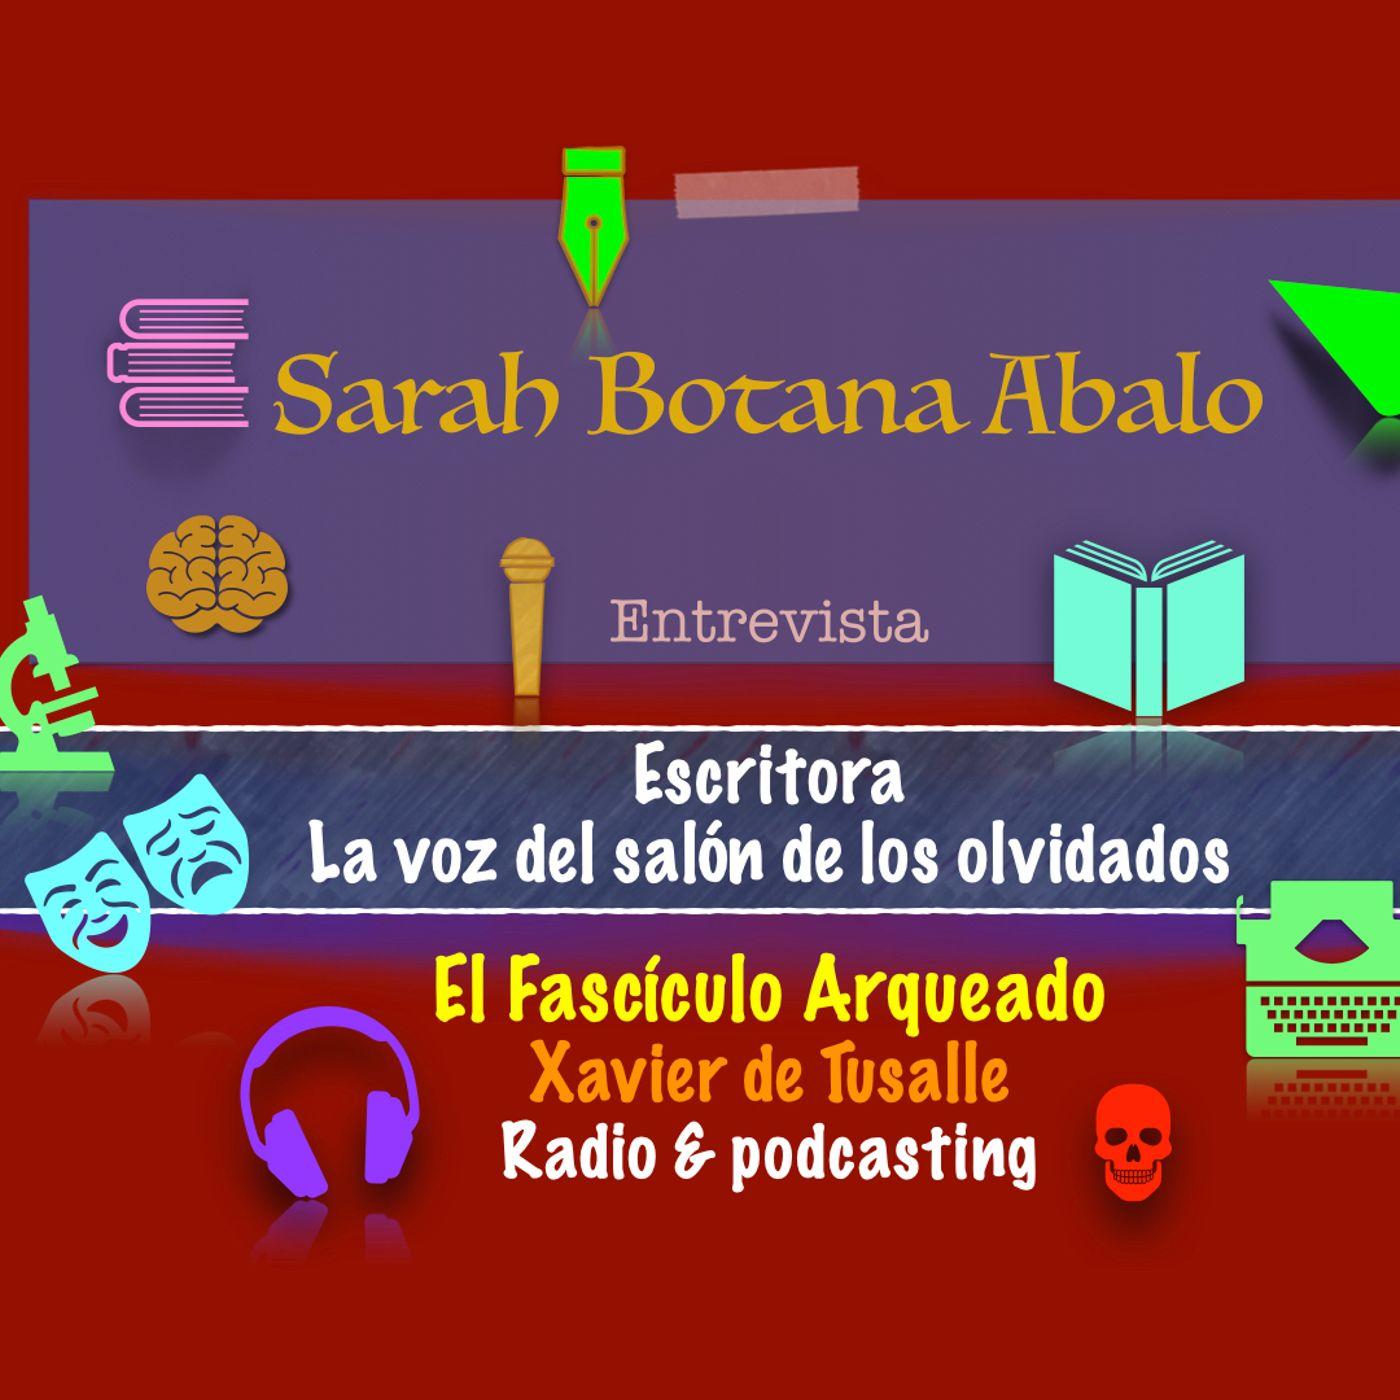 Interesante charla con la escritora Sarah Botana Abalo